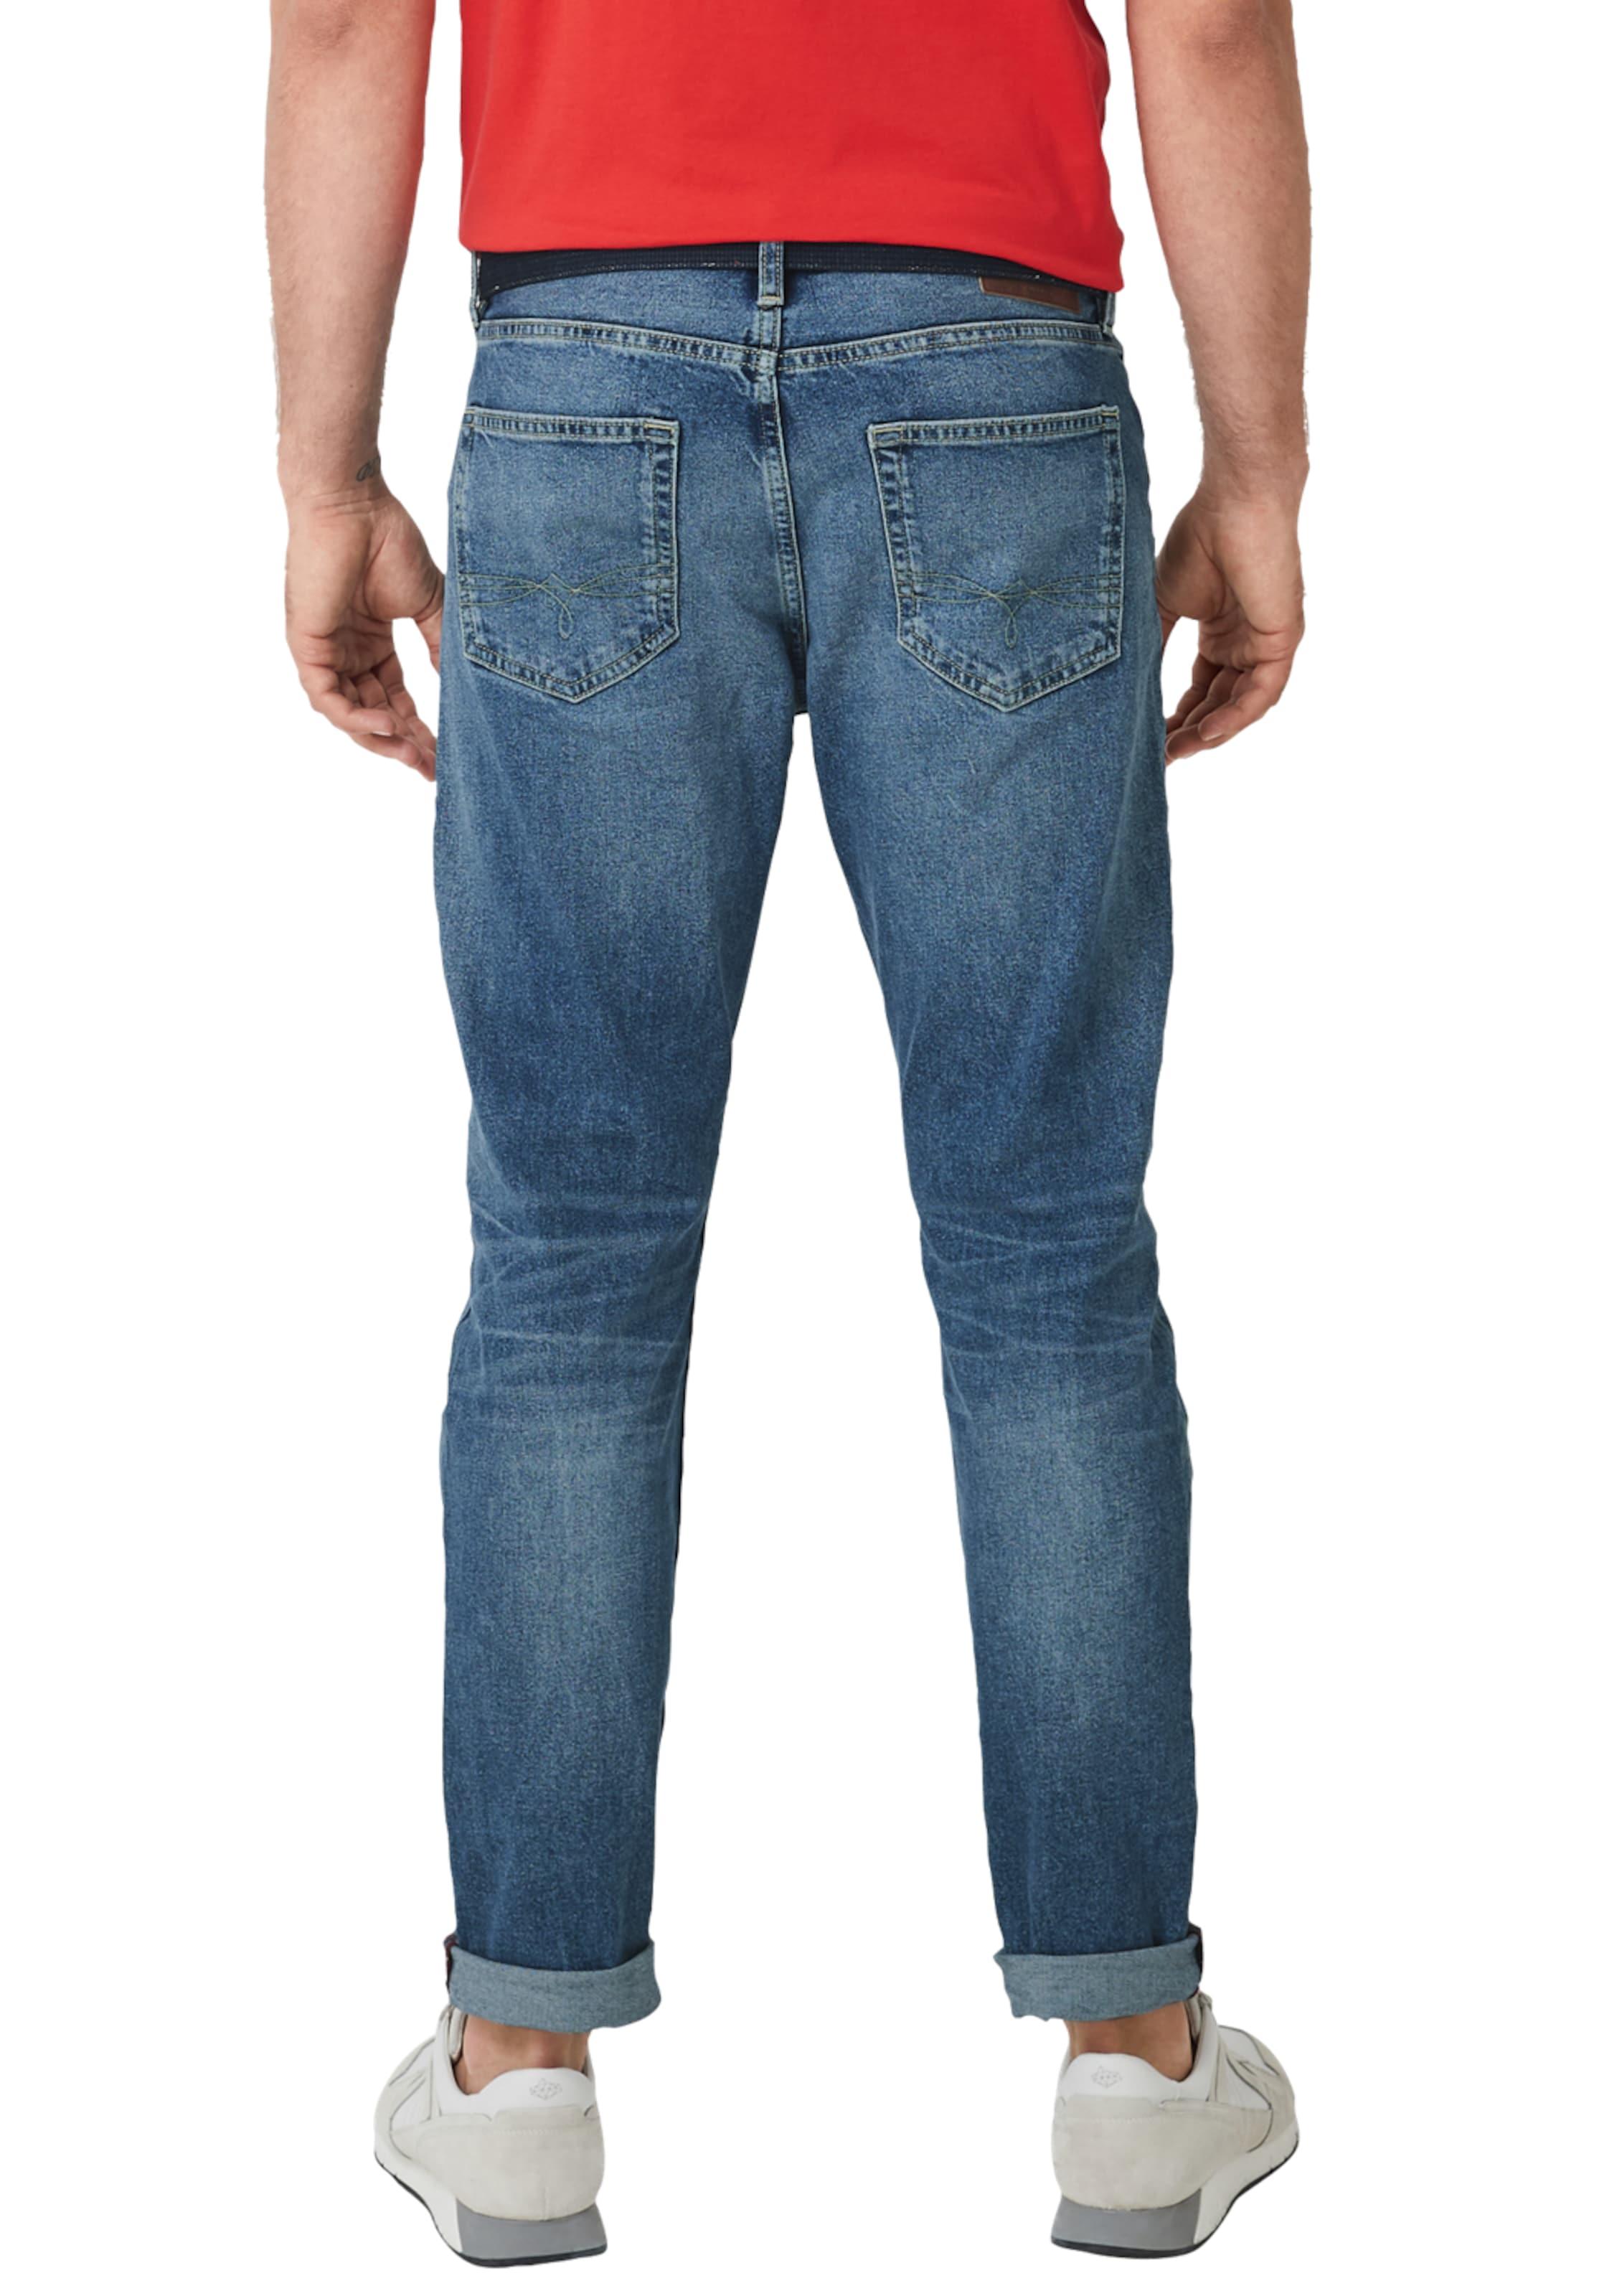 Red S Blau Gürtel In Mit Label oliver Cone TaperedJeans O0Pknw